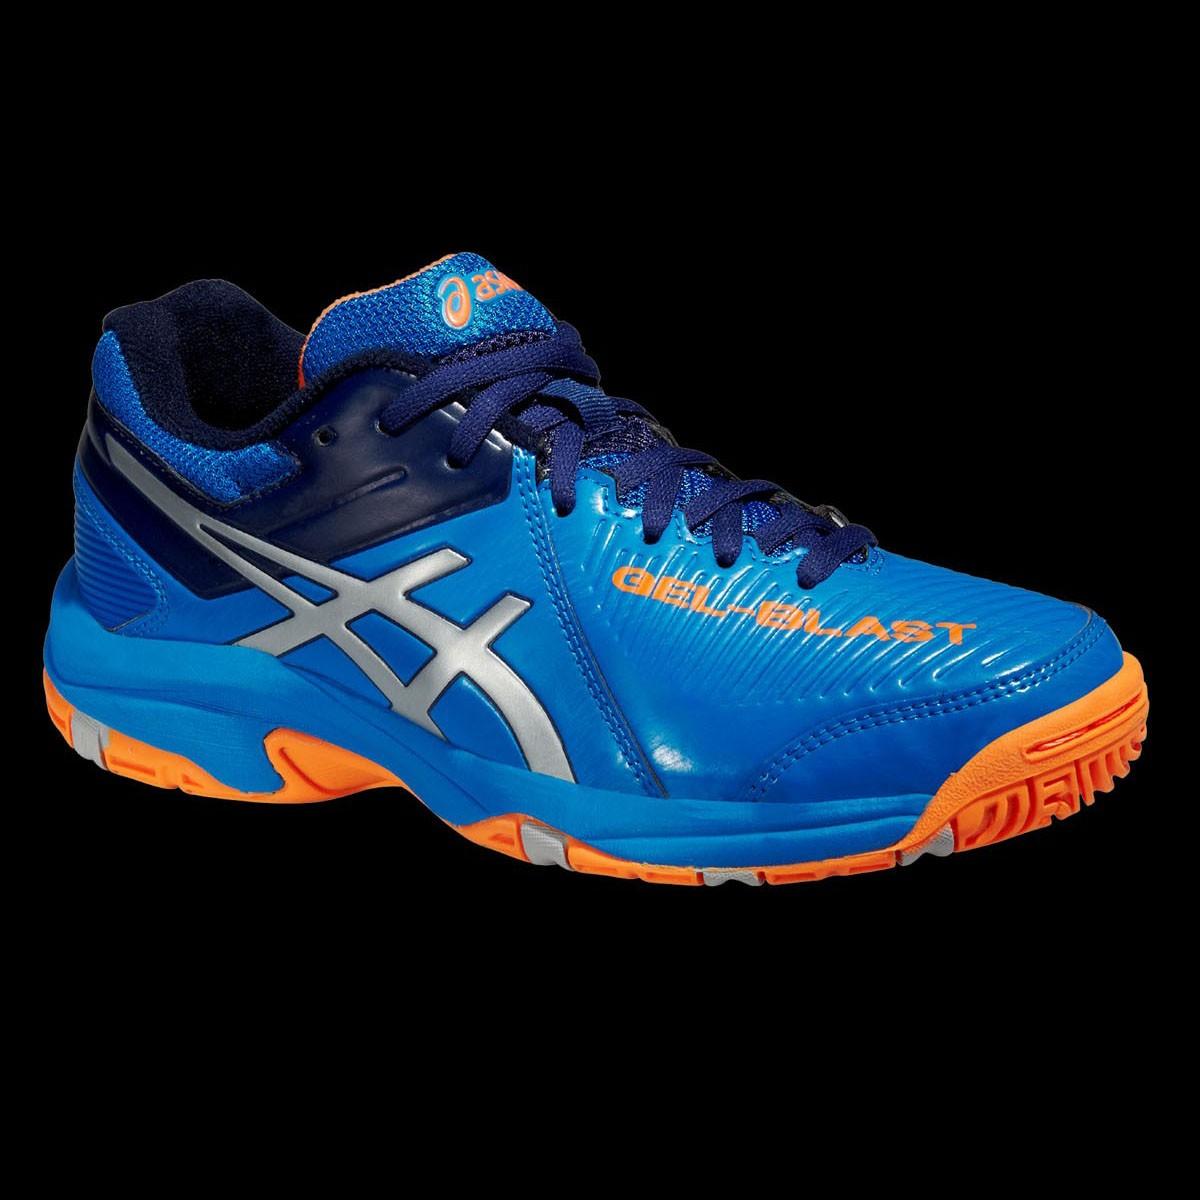 asics GEL-BLAST 6 GS Kids electric blue/orange